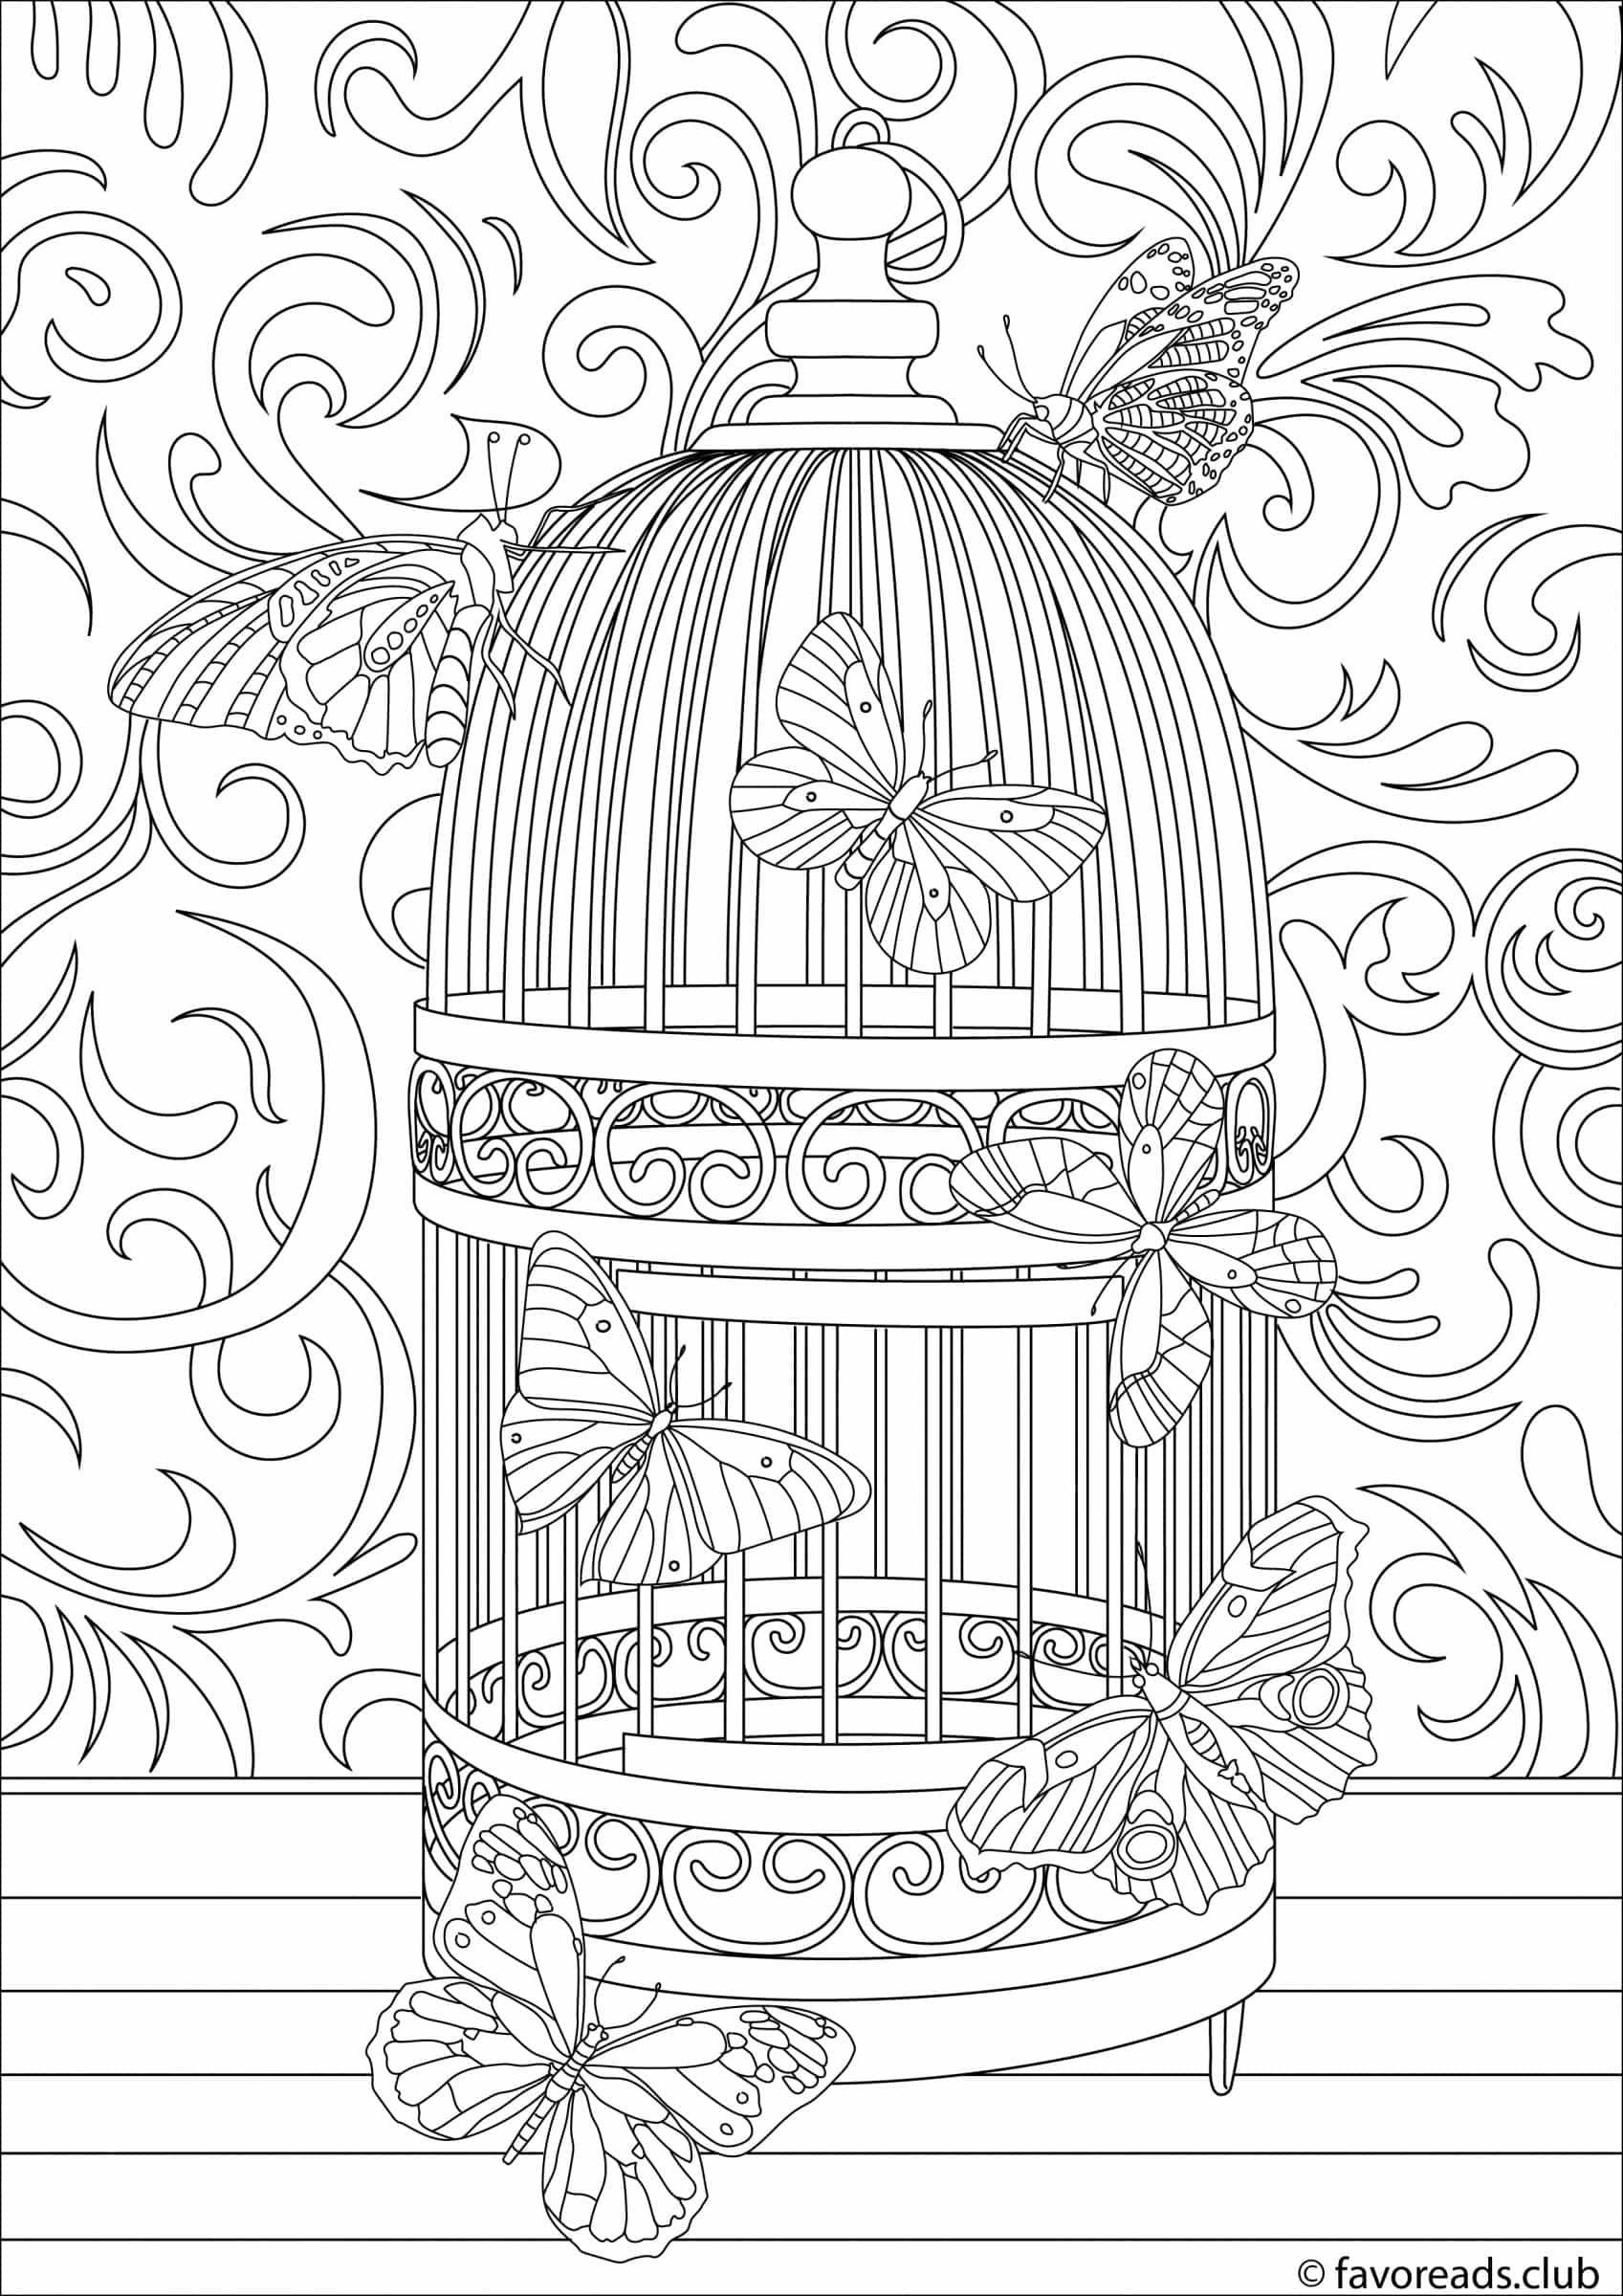 Ausmalbilder Tinkerbell Klara : Birdcage Coloring Page Favoreads Zentangles Adult Colouring